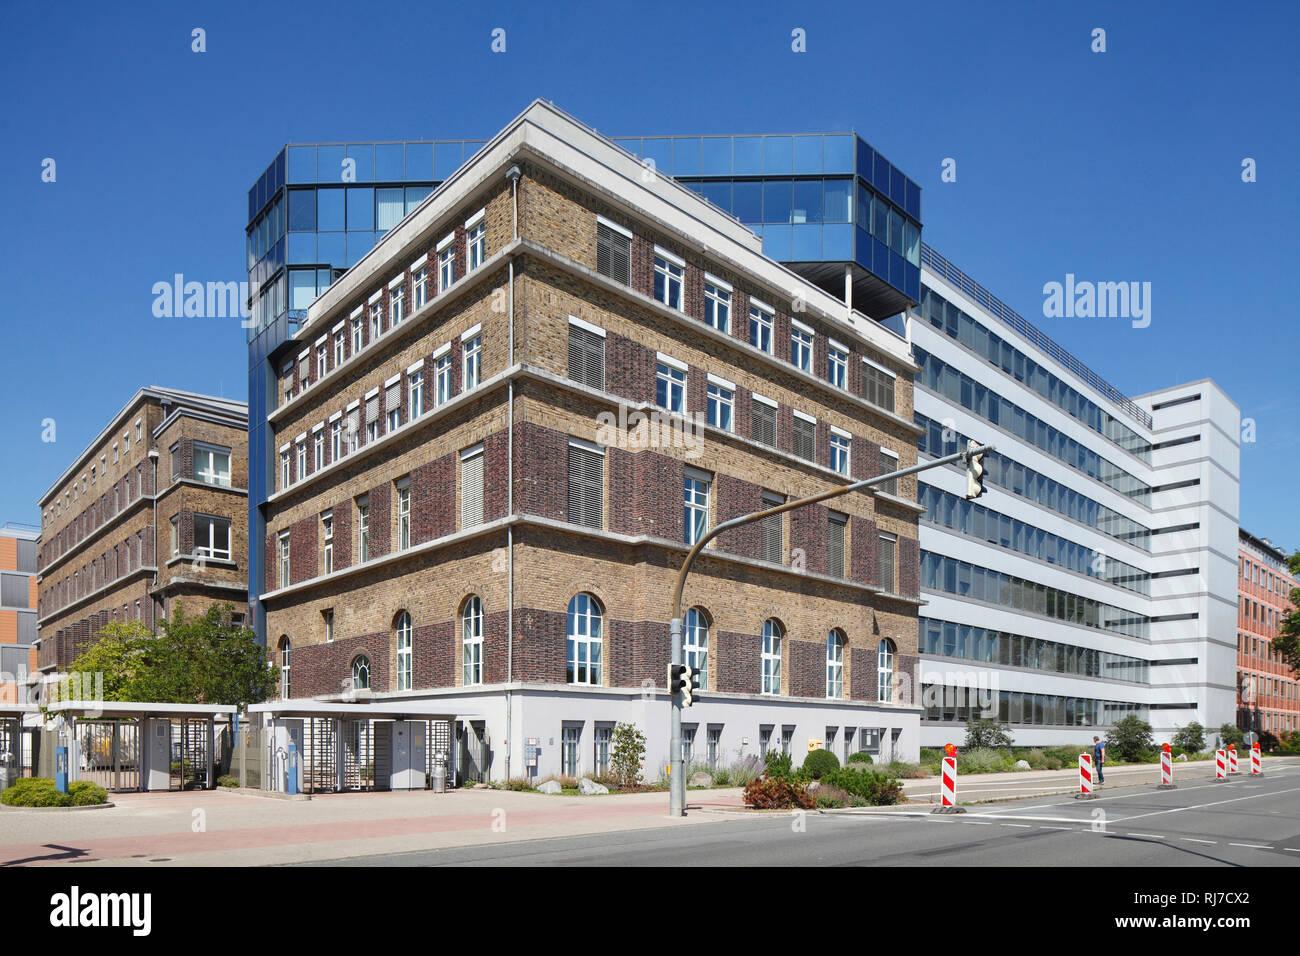 Firmenzentrale der Merck KGaA, Darmstadt, Hessen, Deutschland, Europa - Stock Image